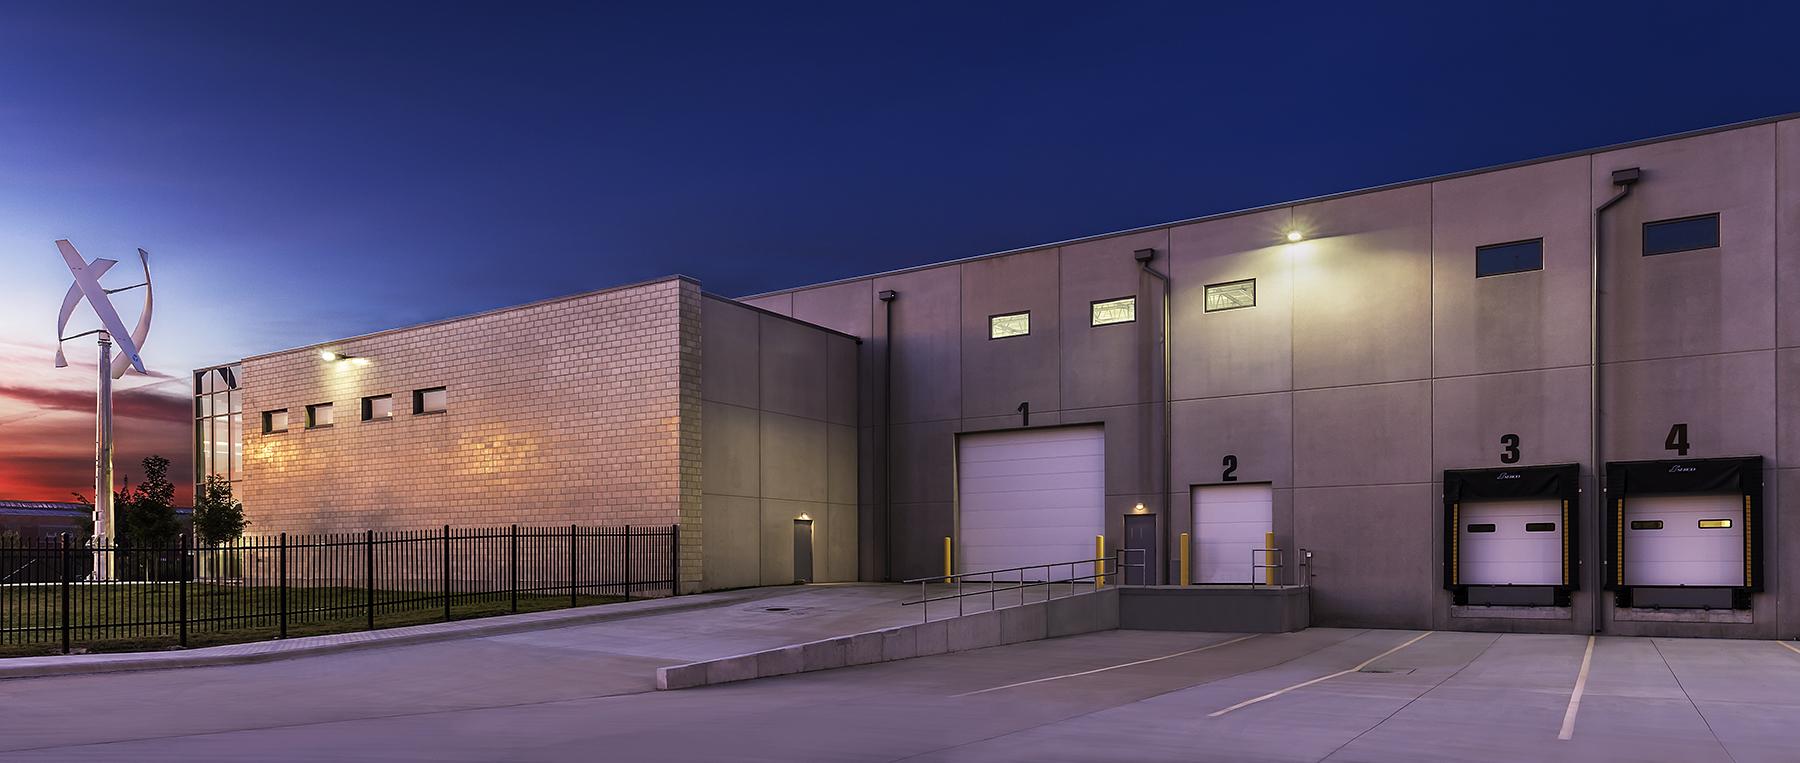 Cedar-Concepts-Chicago-Illinois-Dock-Ele